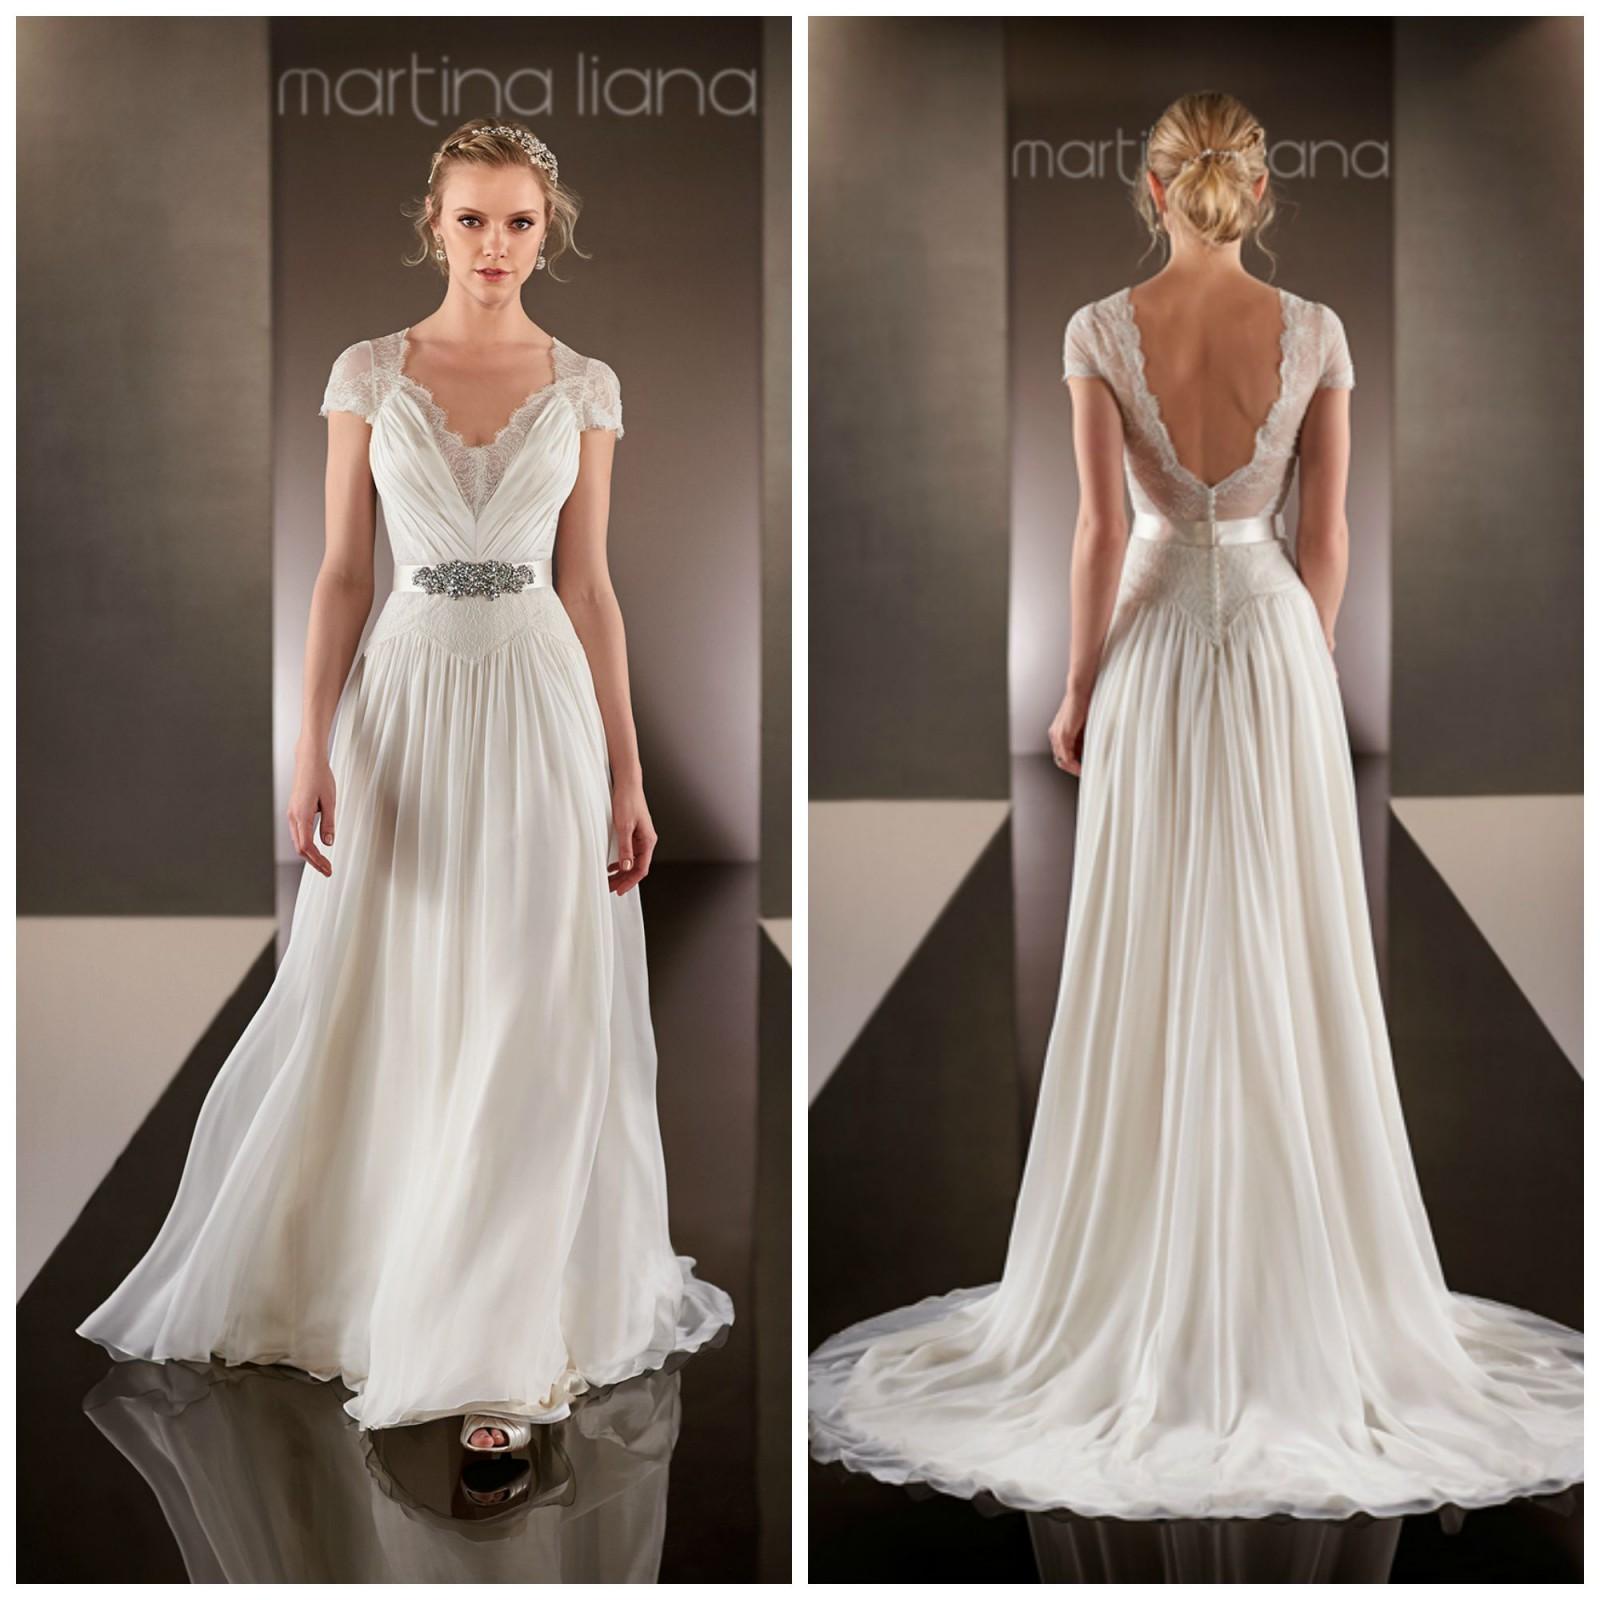 Martina Liana 574 Used Wedding Dress On Sale 47% Off